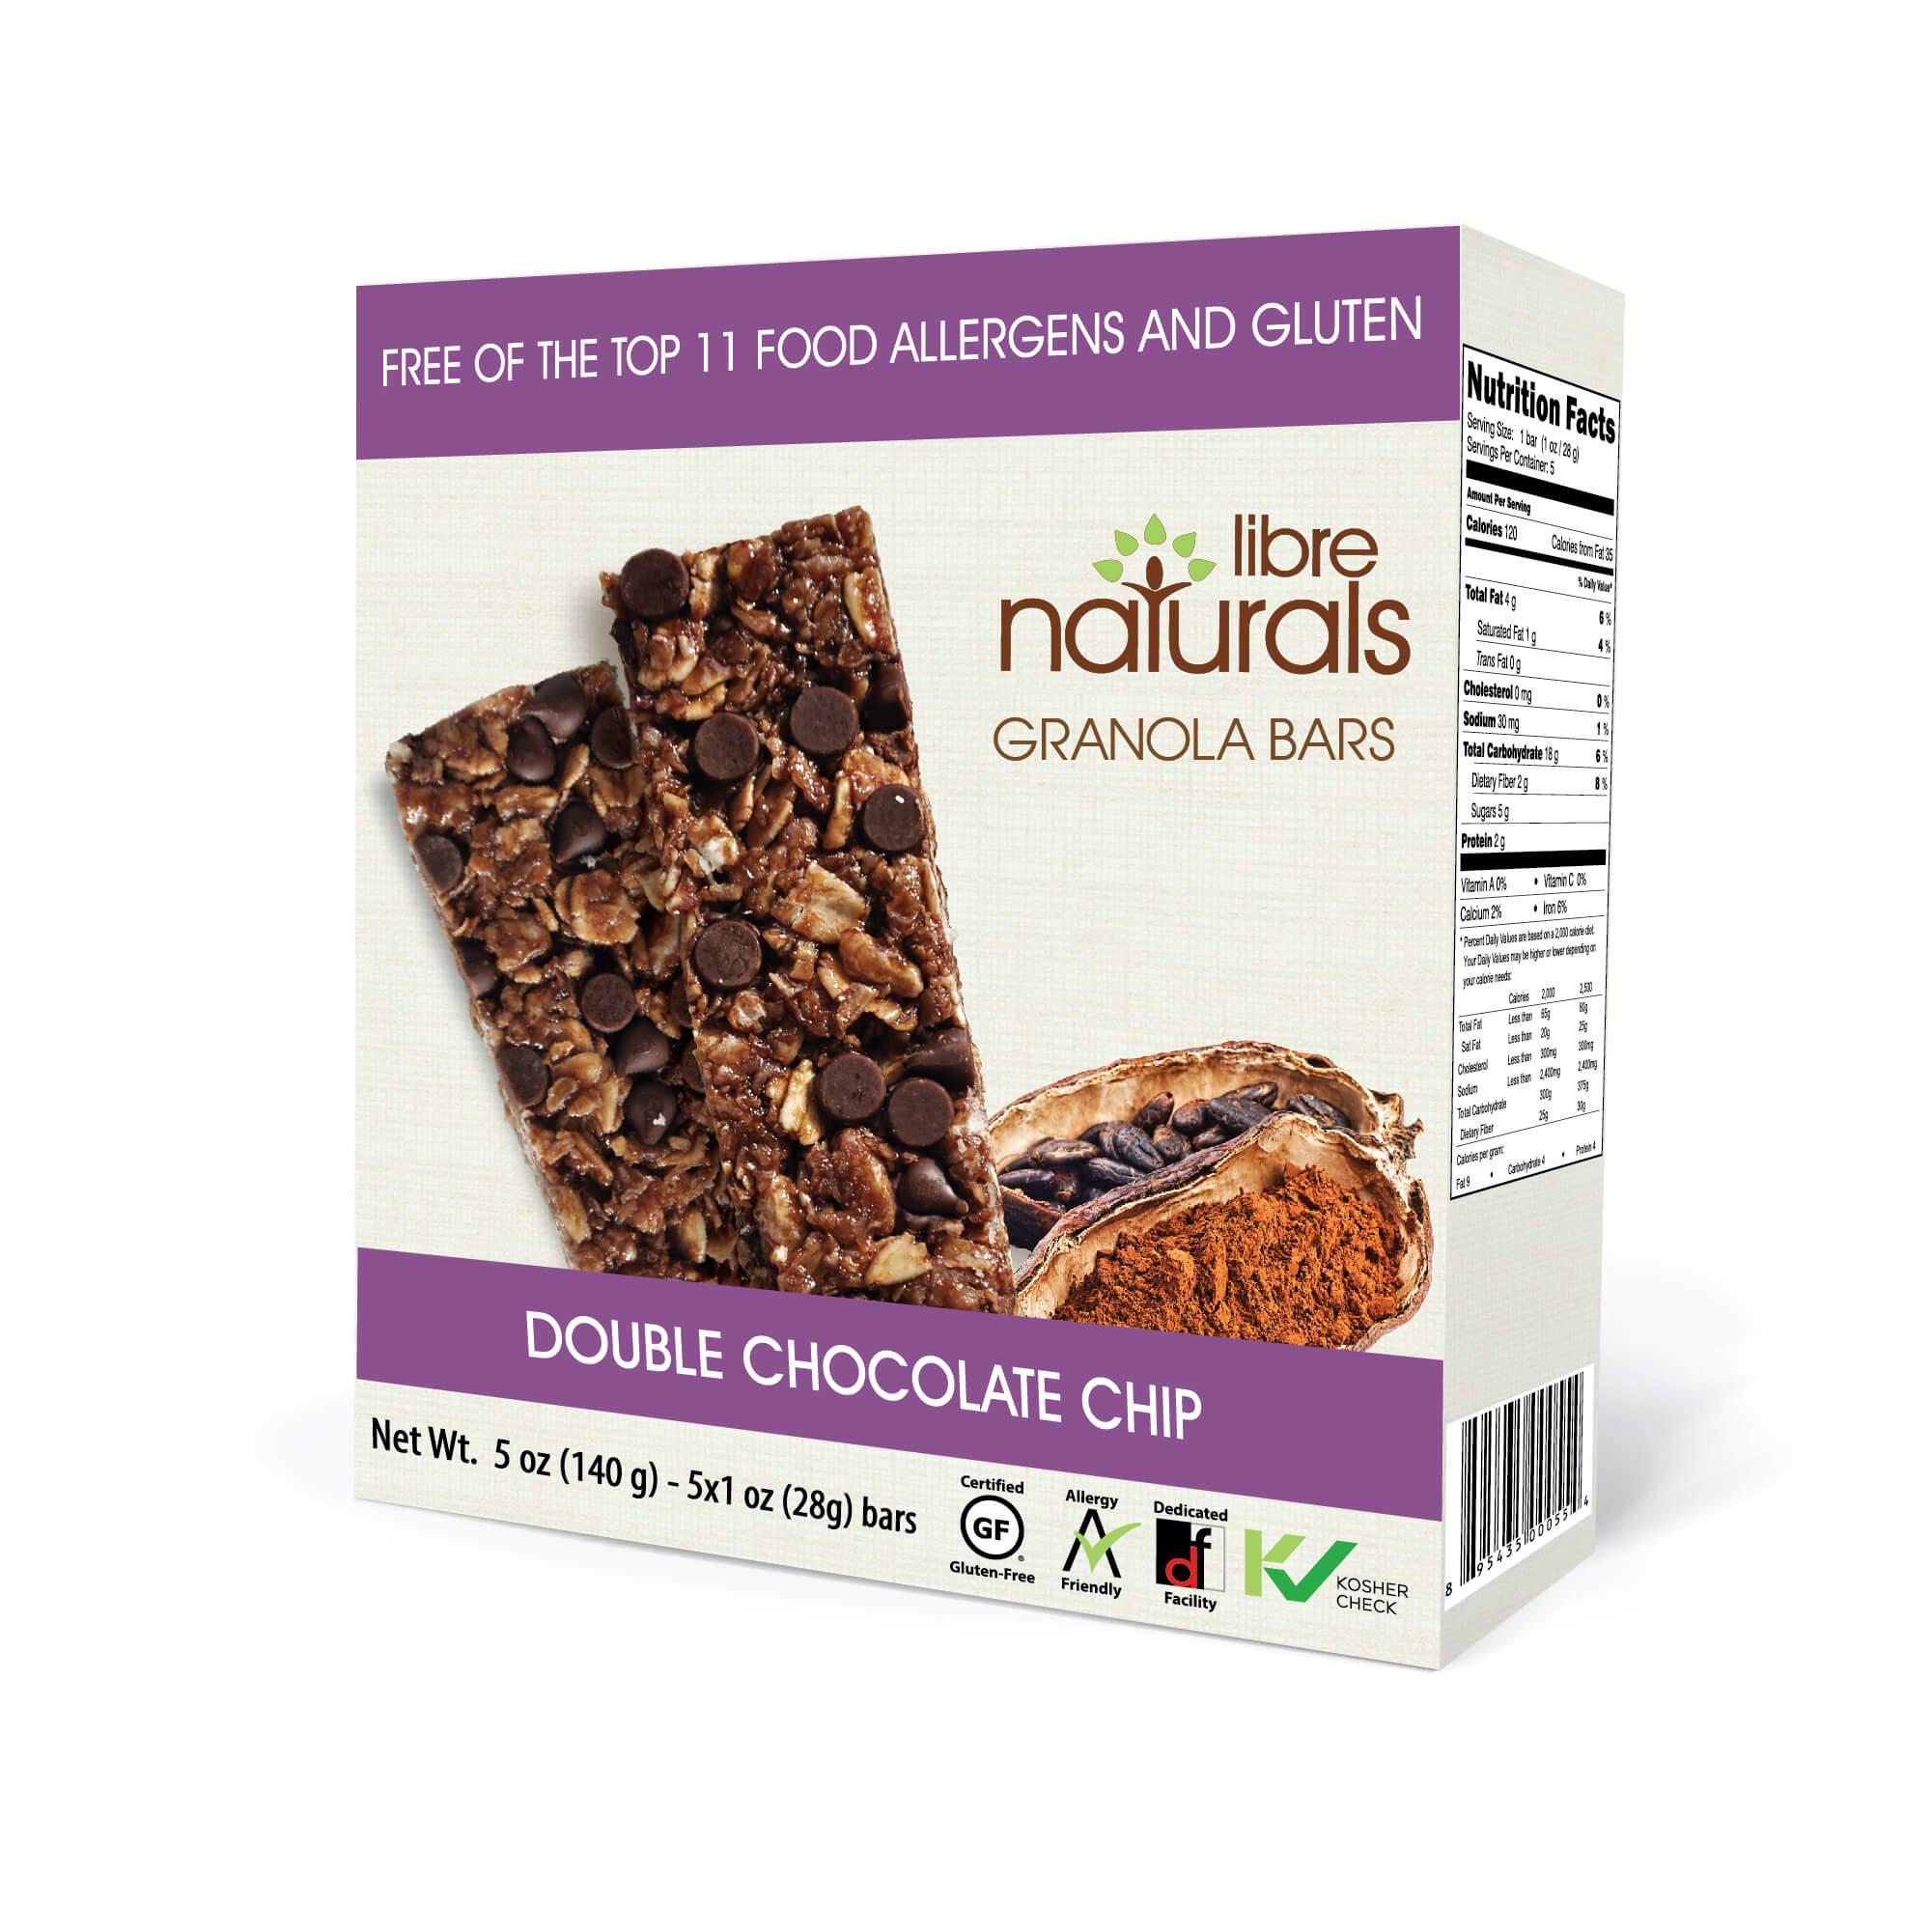 Nut Free, Gluten Free >> Double Chocolate Chip Vegan Granola Bar - Libre Naturals, 28 gram, 5 pack x 6 (30 Bars)